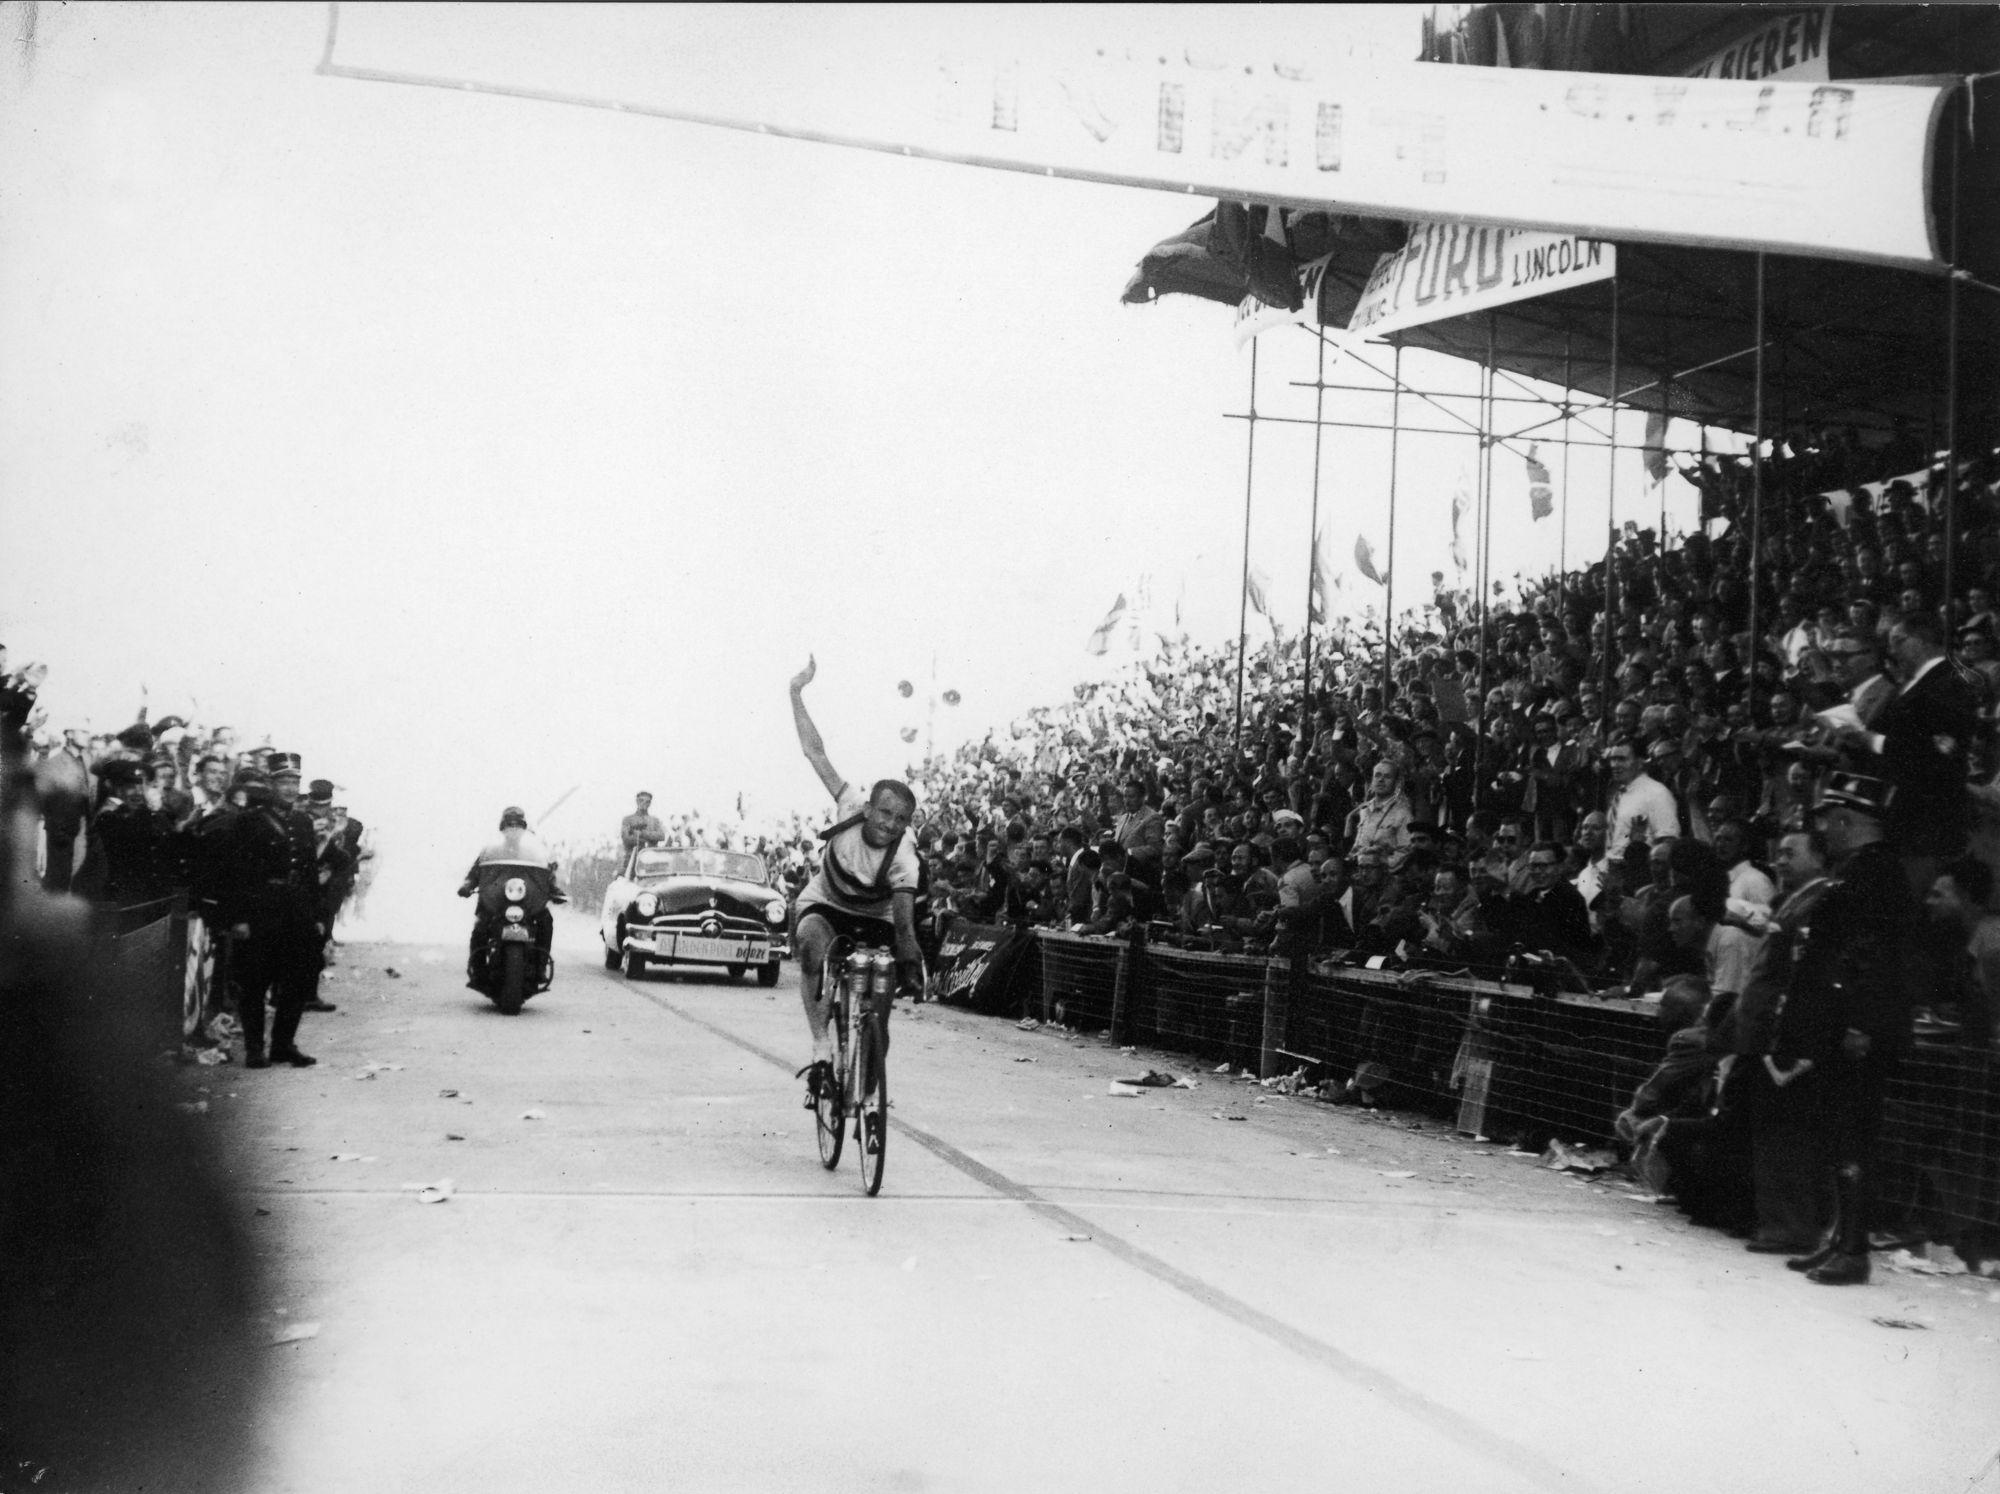 Wereldkampioenschap wielrennen in 1950